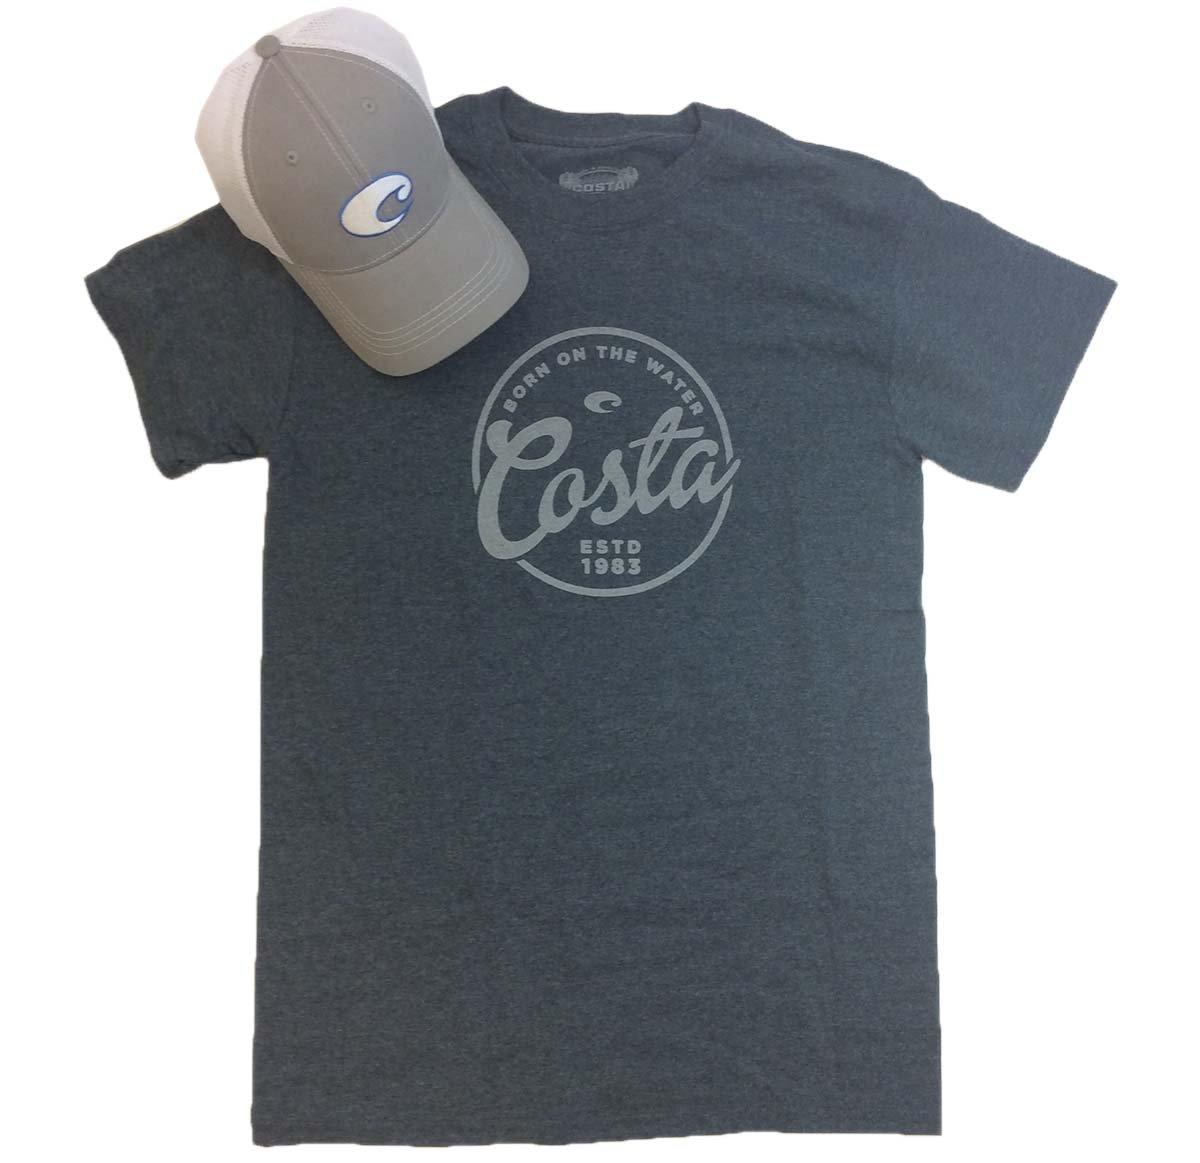 Costa Del Mar Men's Logo Hat And Freeboard T-shirt Bundle Gift Set-Dark Heather-XXL